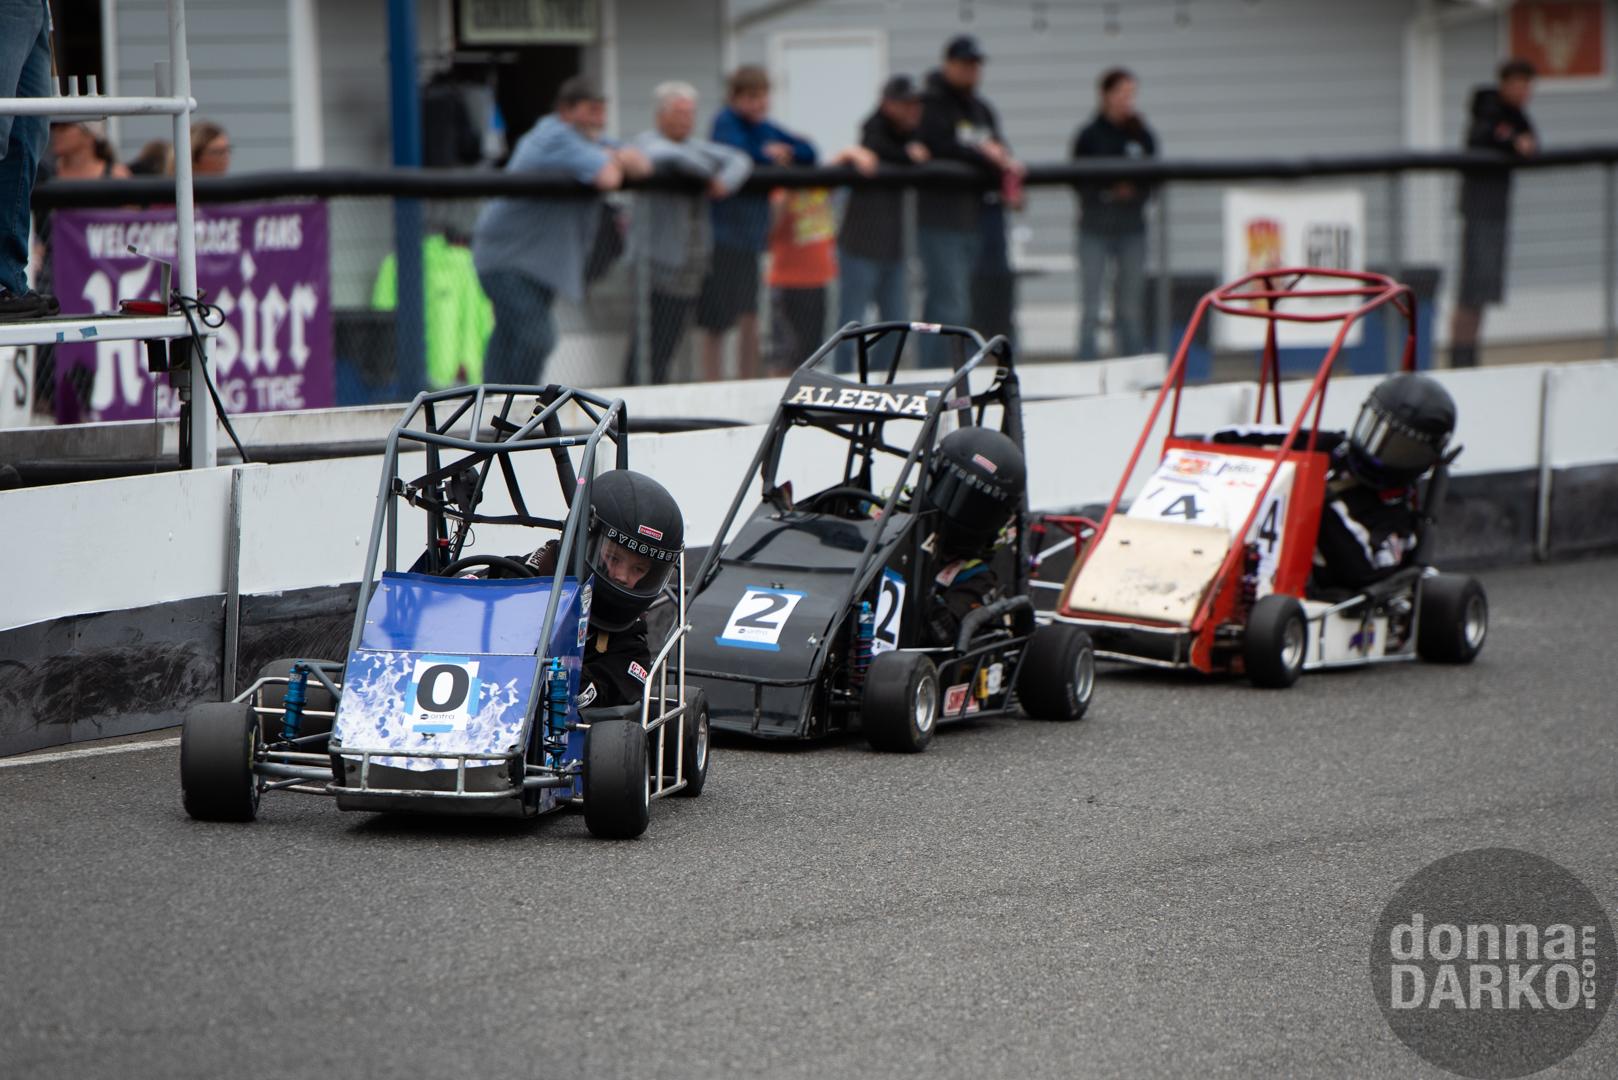 QWMA (Racing) 8-11-2019 DSC_6409.jpg